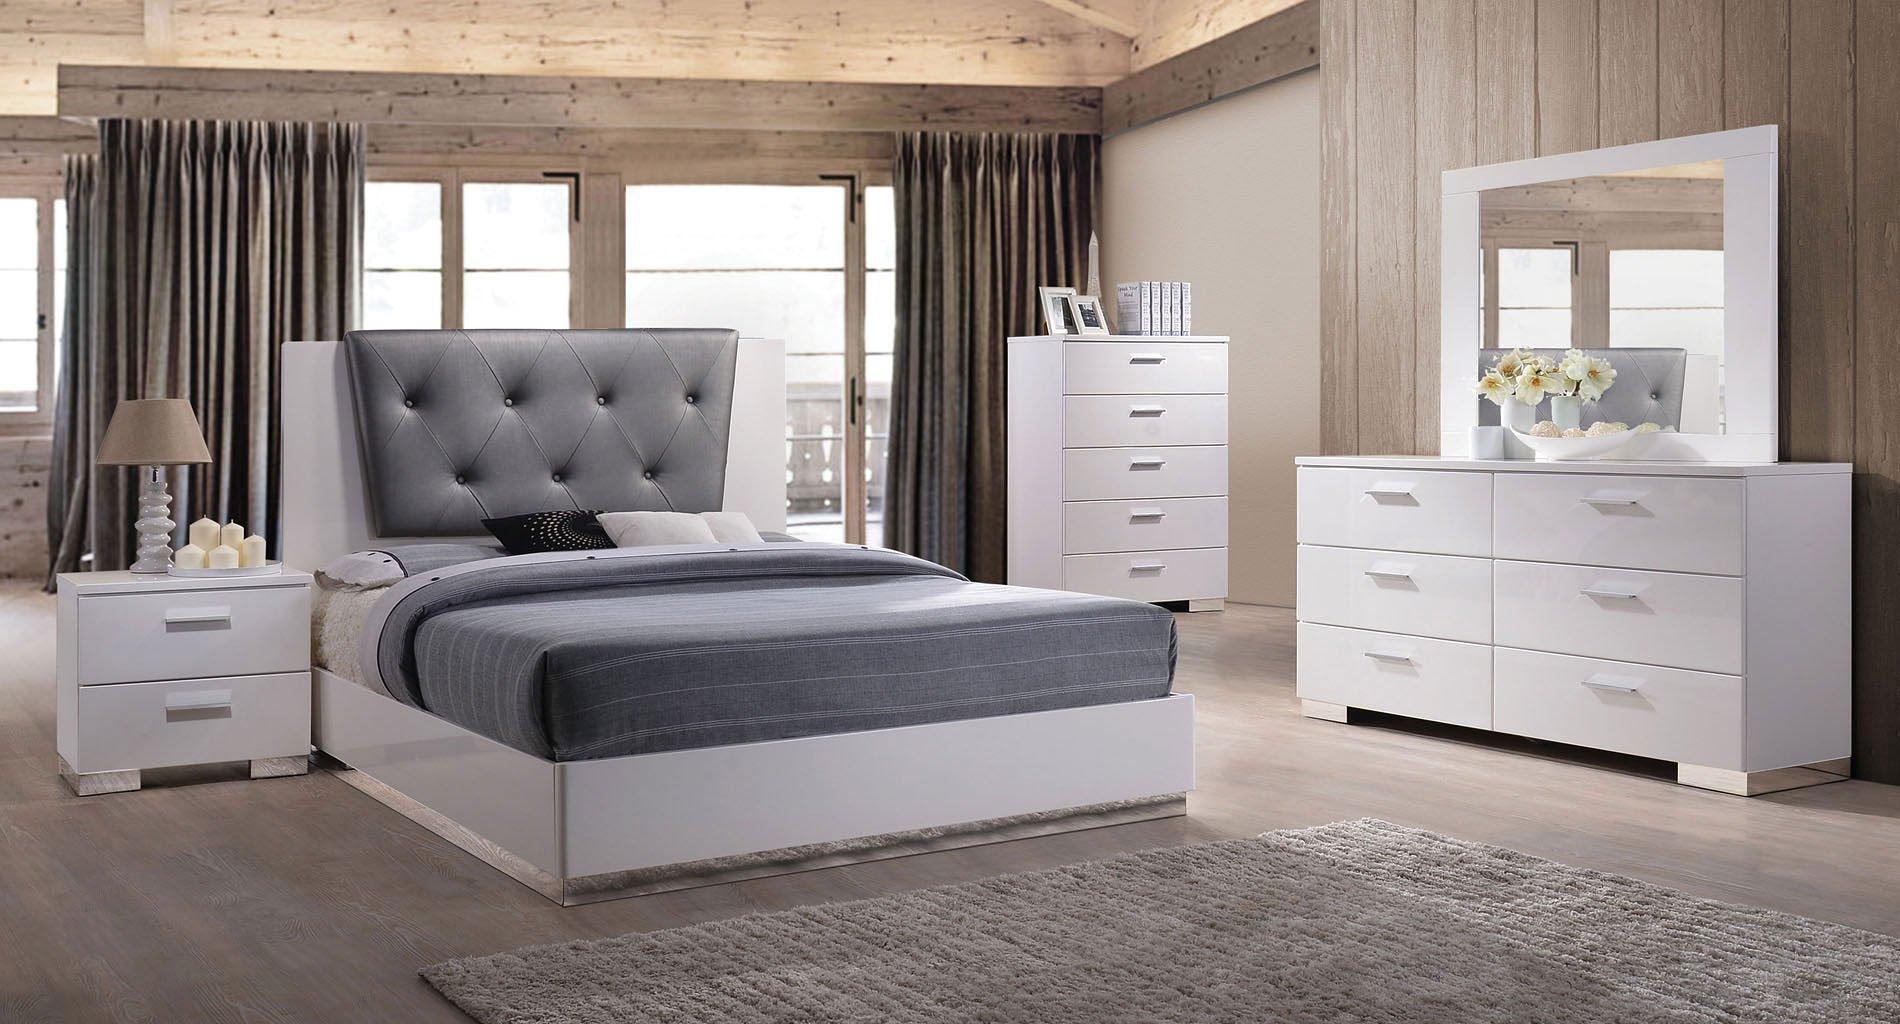 Charmant Lorimar II Low Profile Bedroom Set